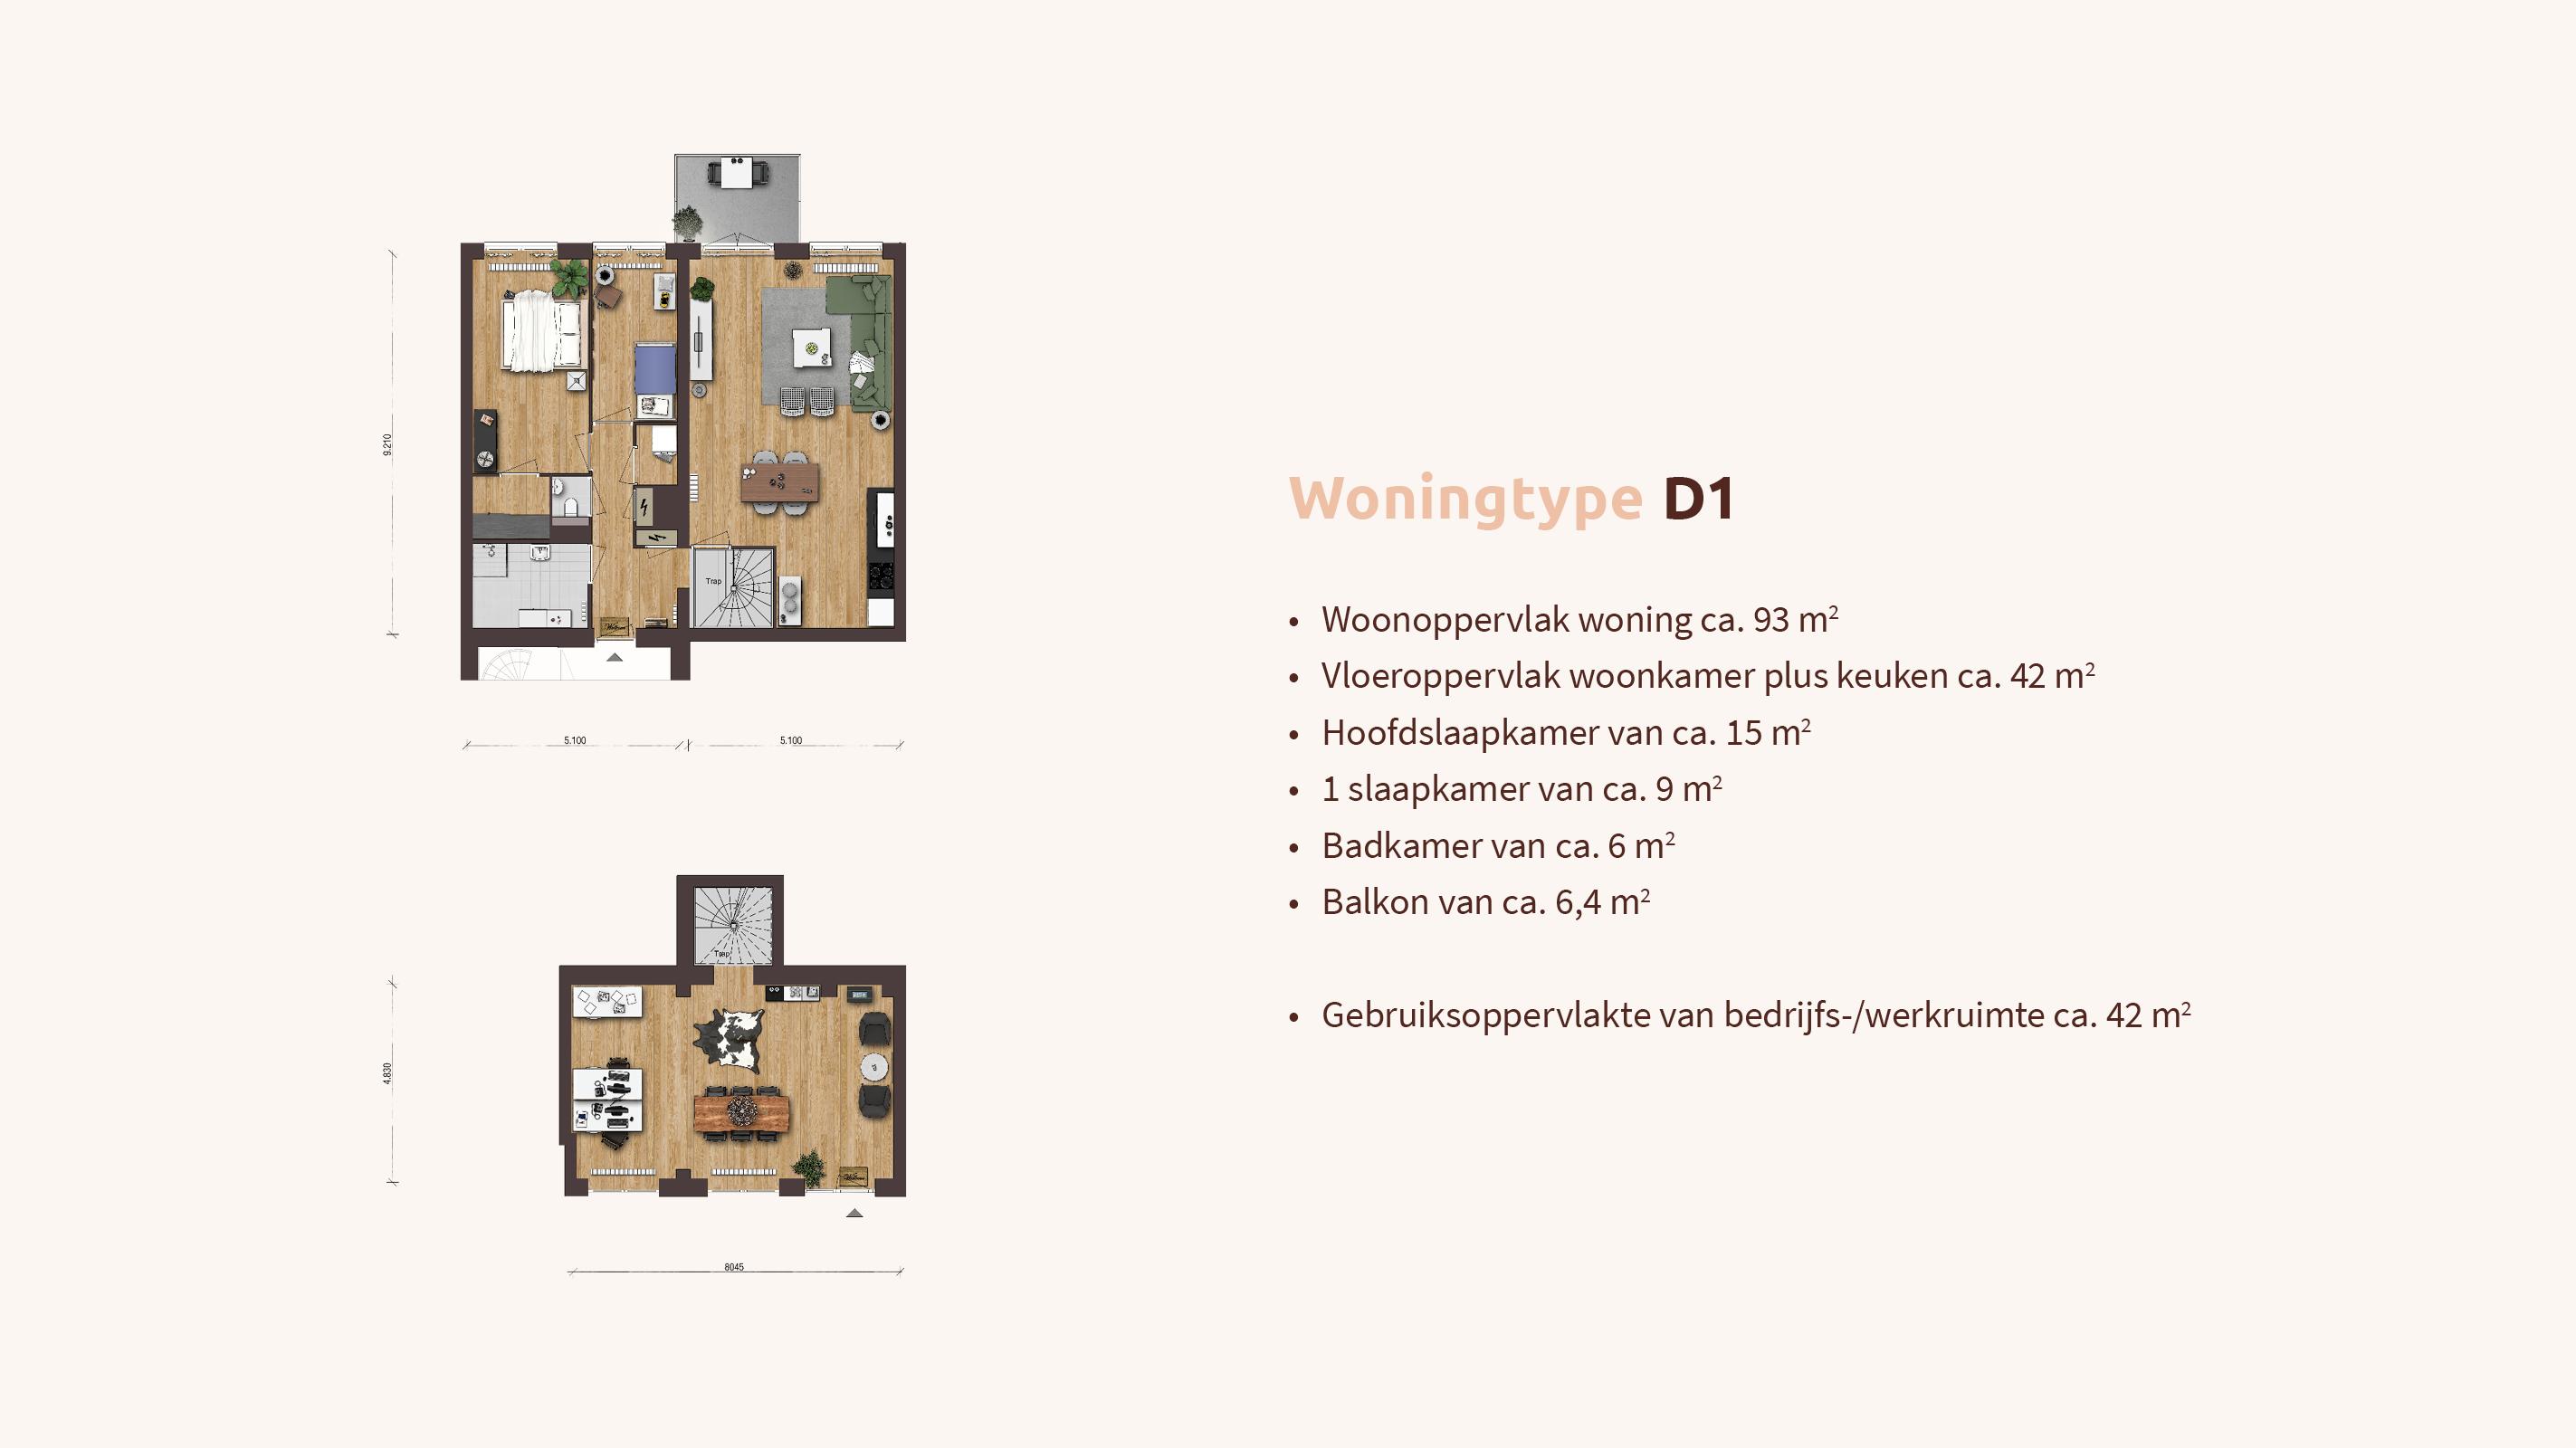 Woningtype - Woon-werk - Plattegrond D1 - Appartementen Leidsche Rijn - Picaz Utrecht